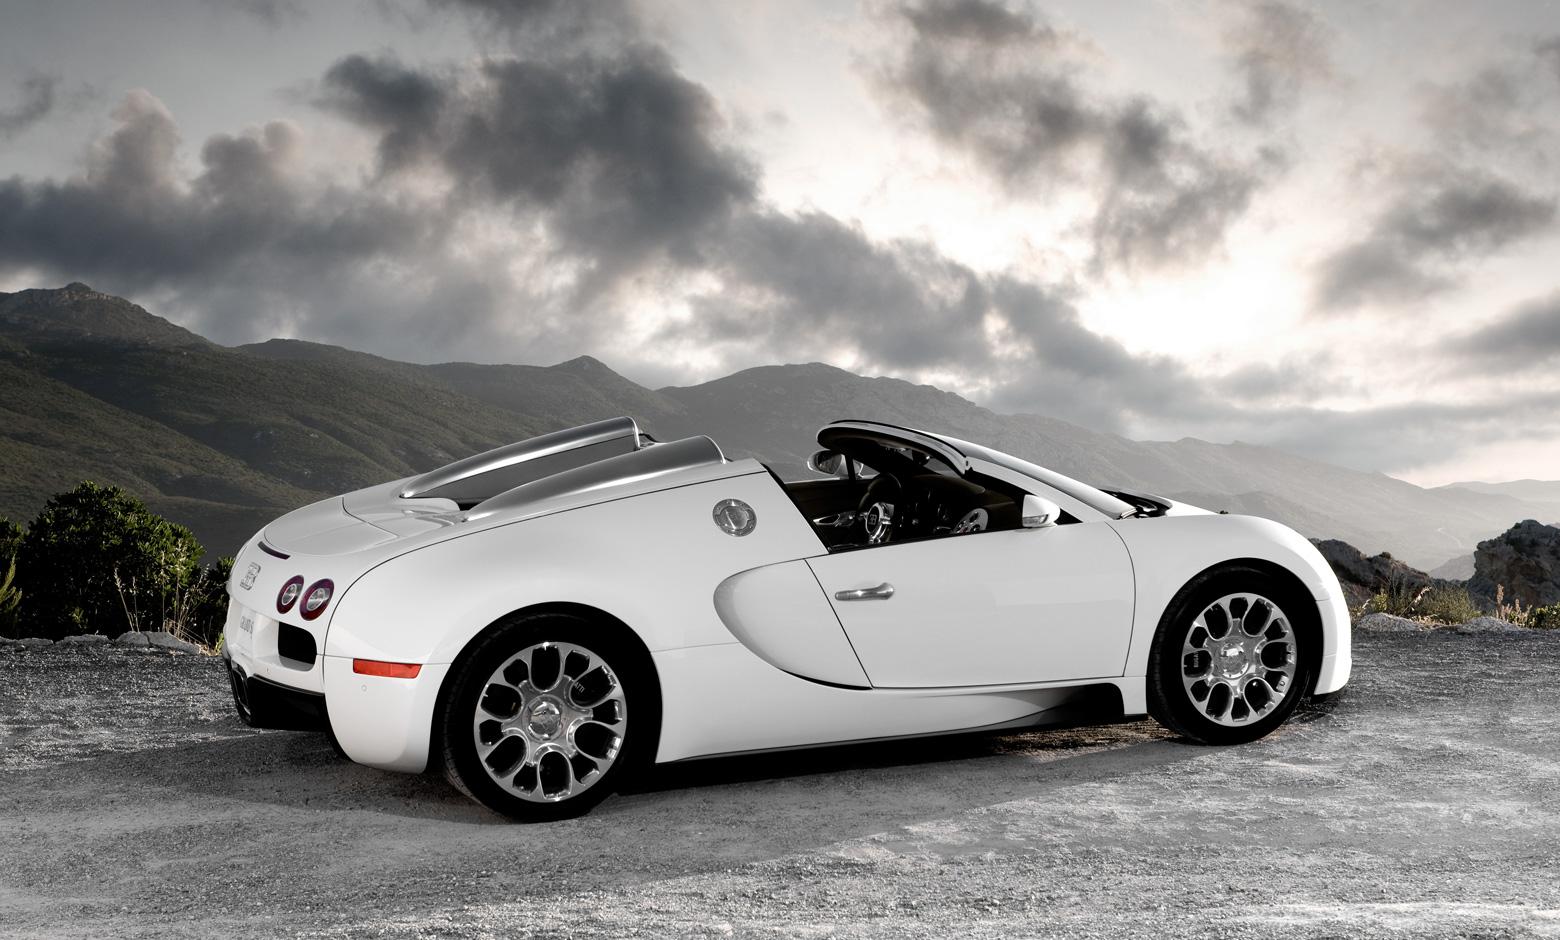 Bugatti Veyron Pics, Vehicles Collection